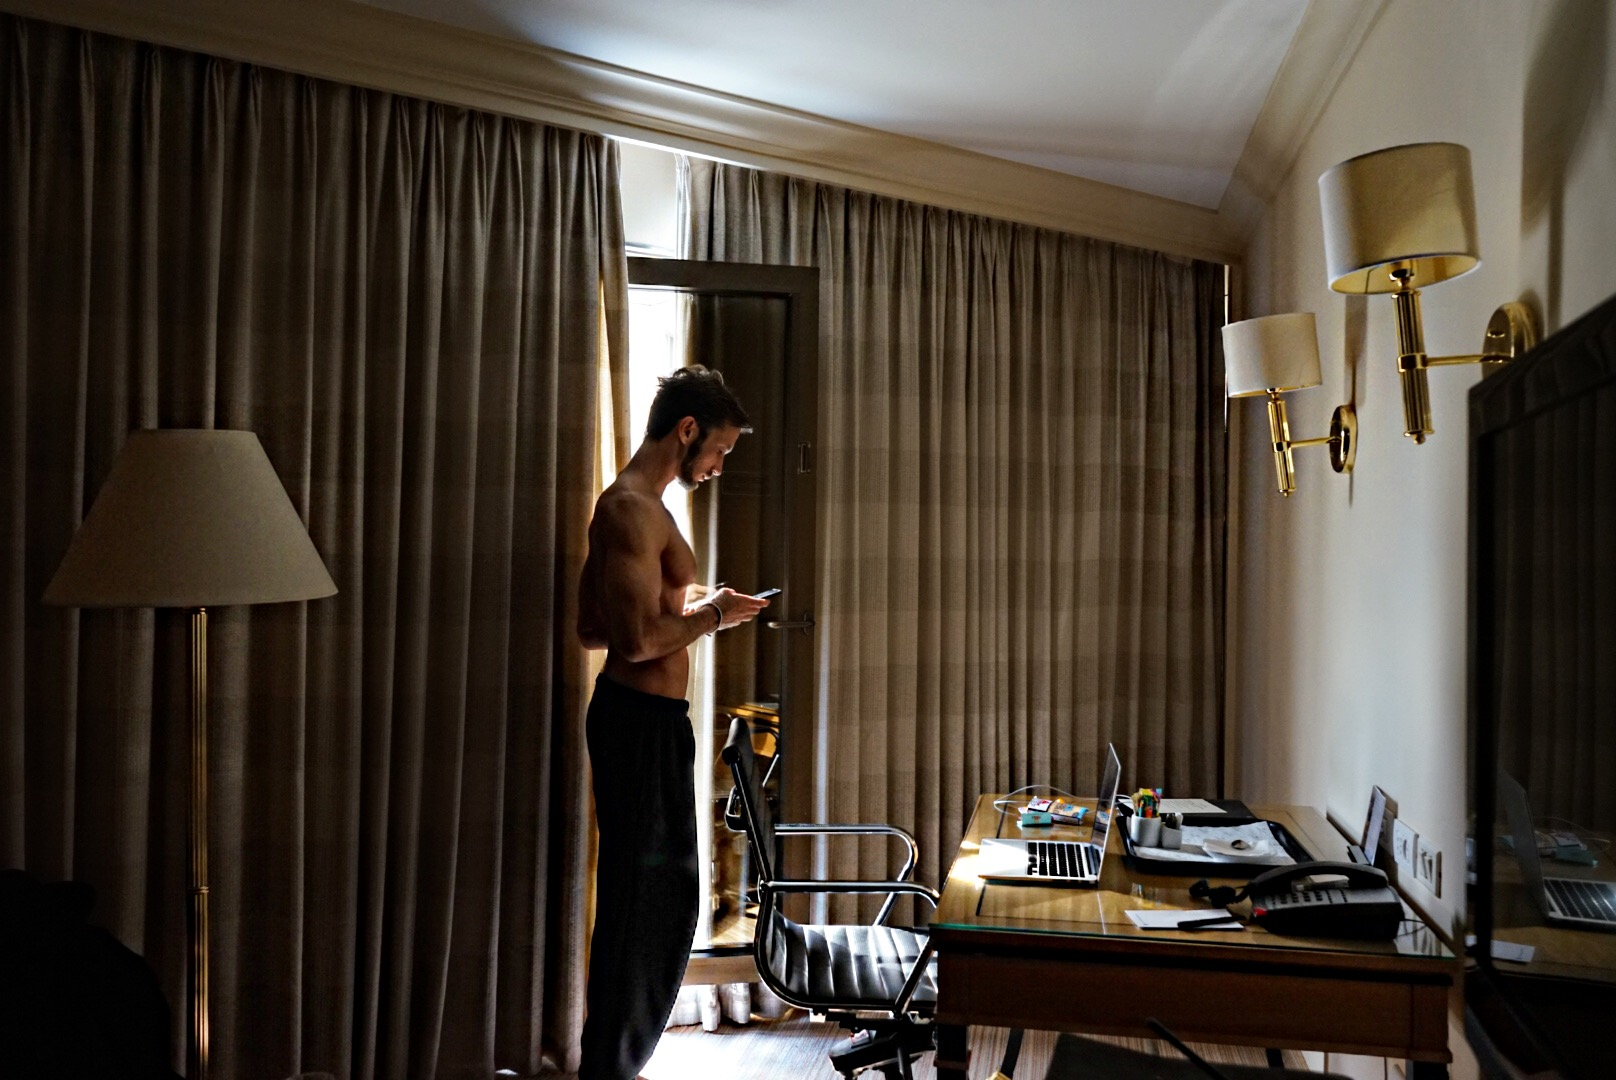 """I REALLY LIKE TO ESCAPE, ESCAPE TO HOTELS.."" Location: David InterContinental Tel Aviv"